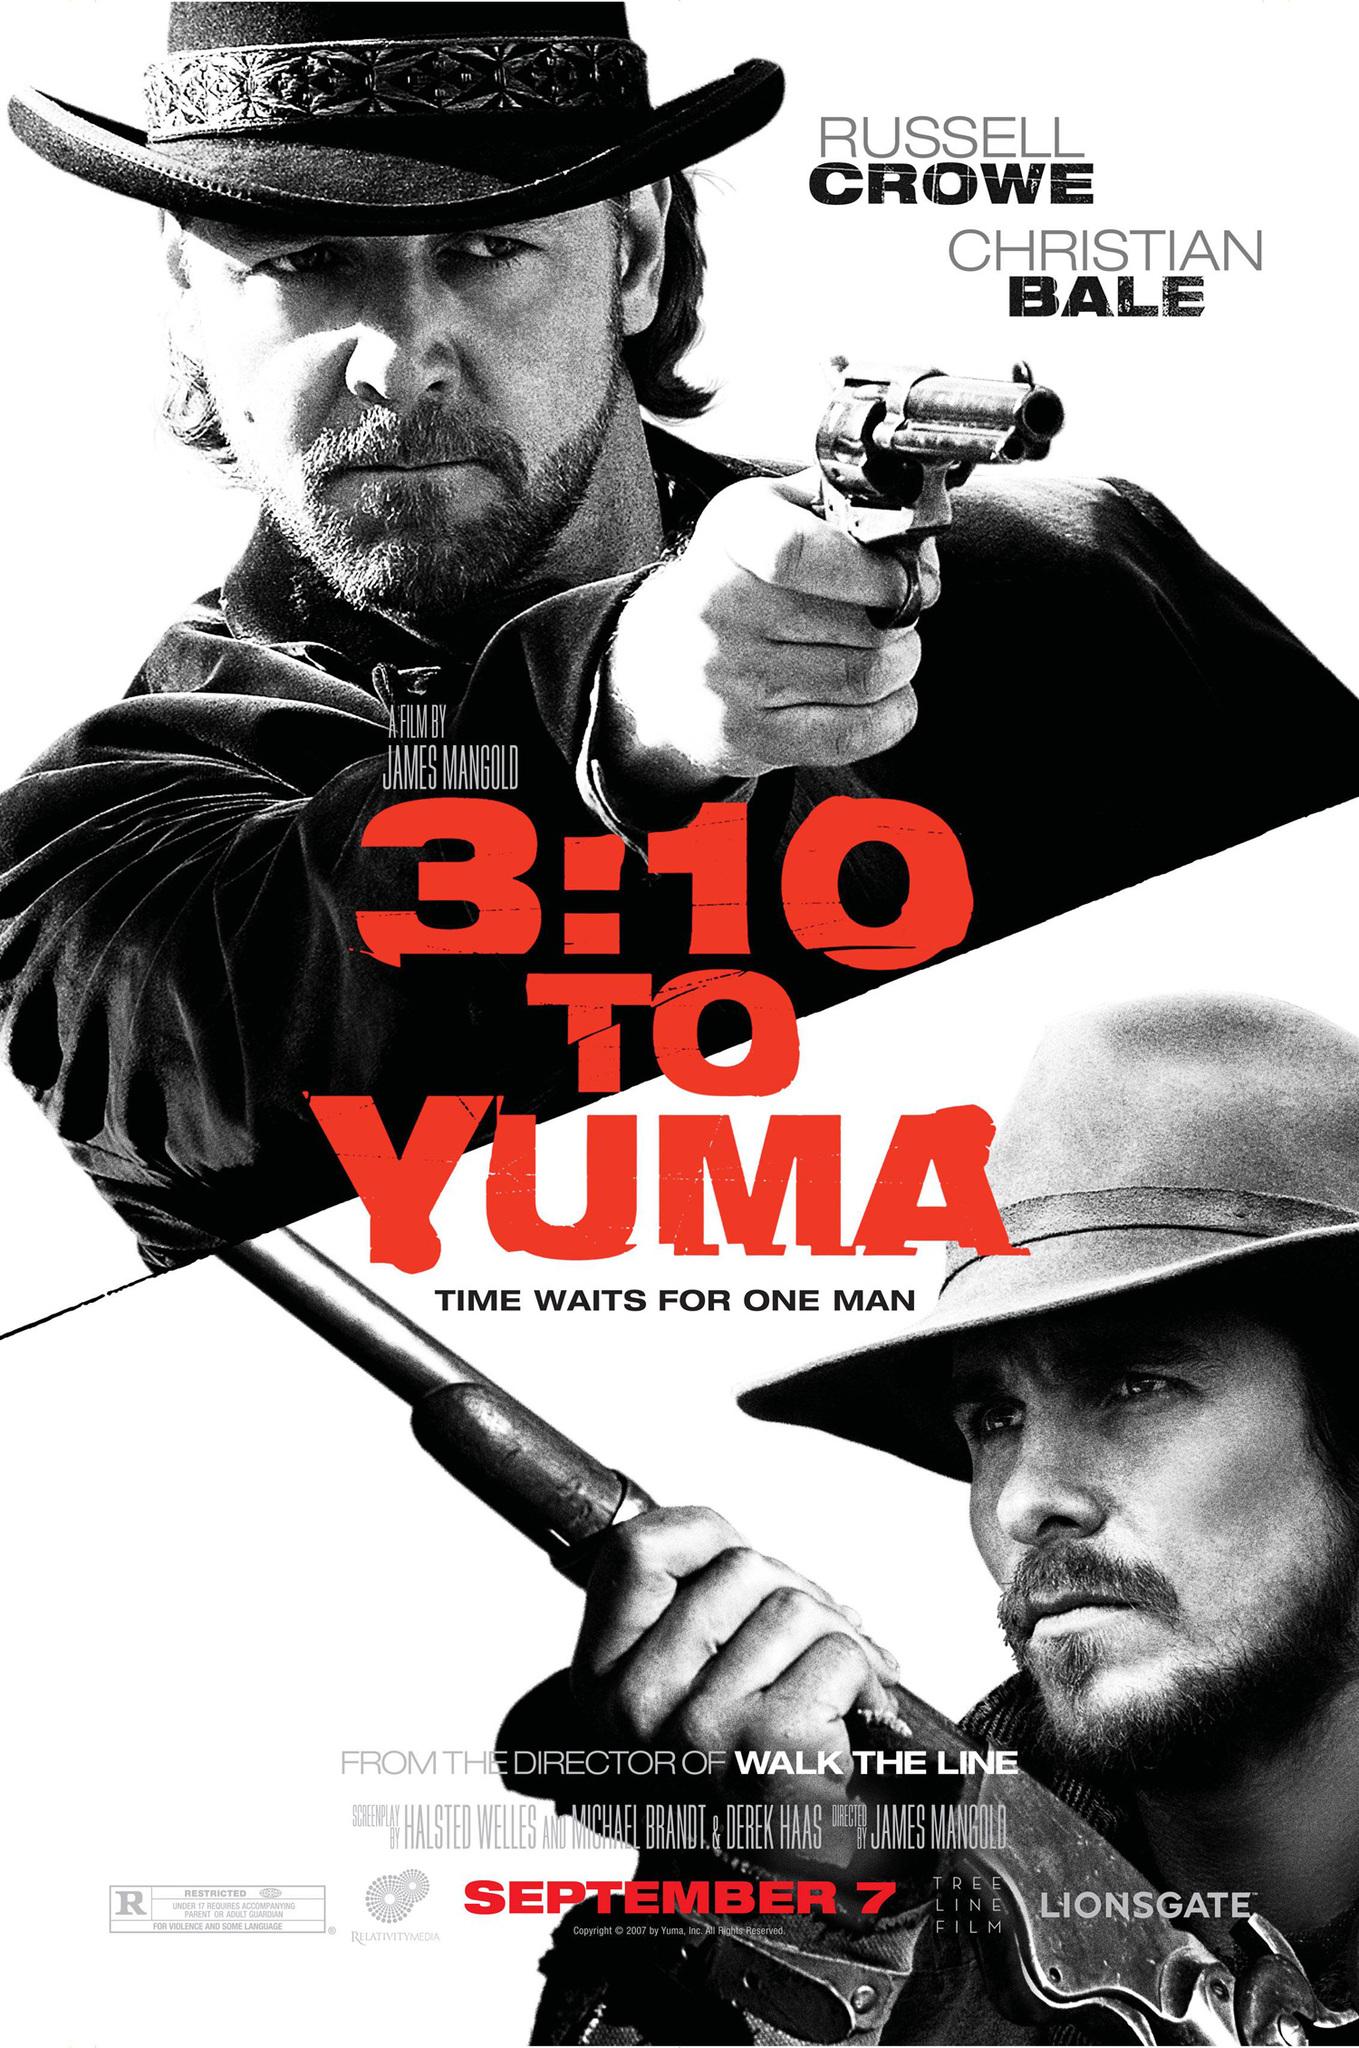 image 3:10 to Yuma Watch Full Movie Free Online